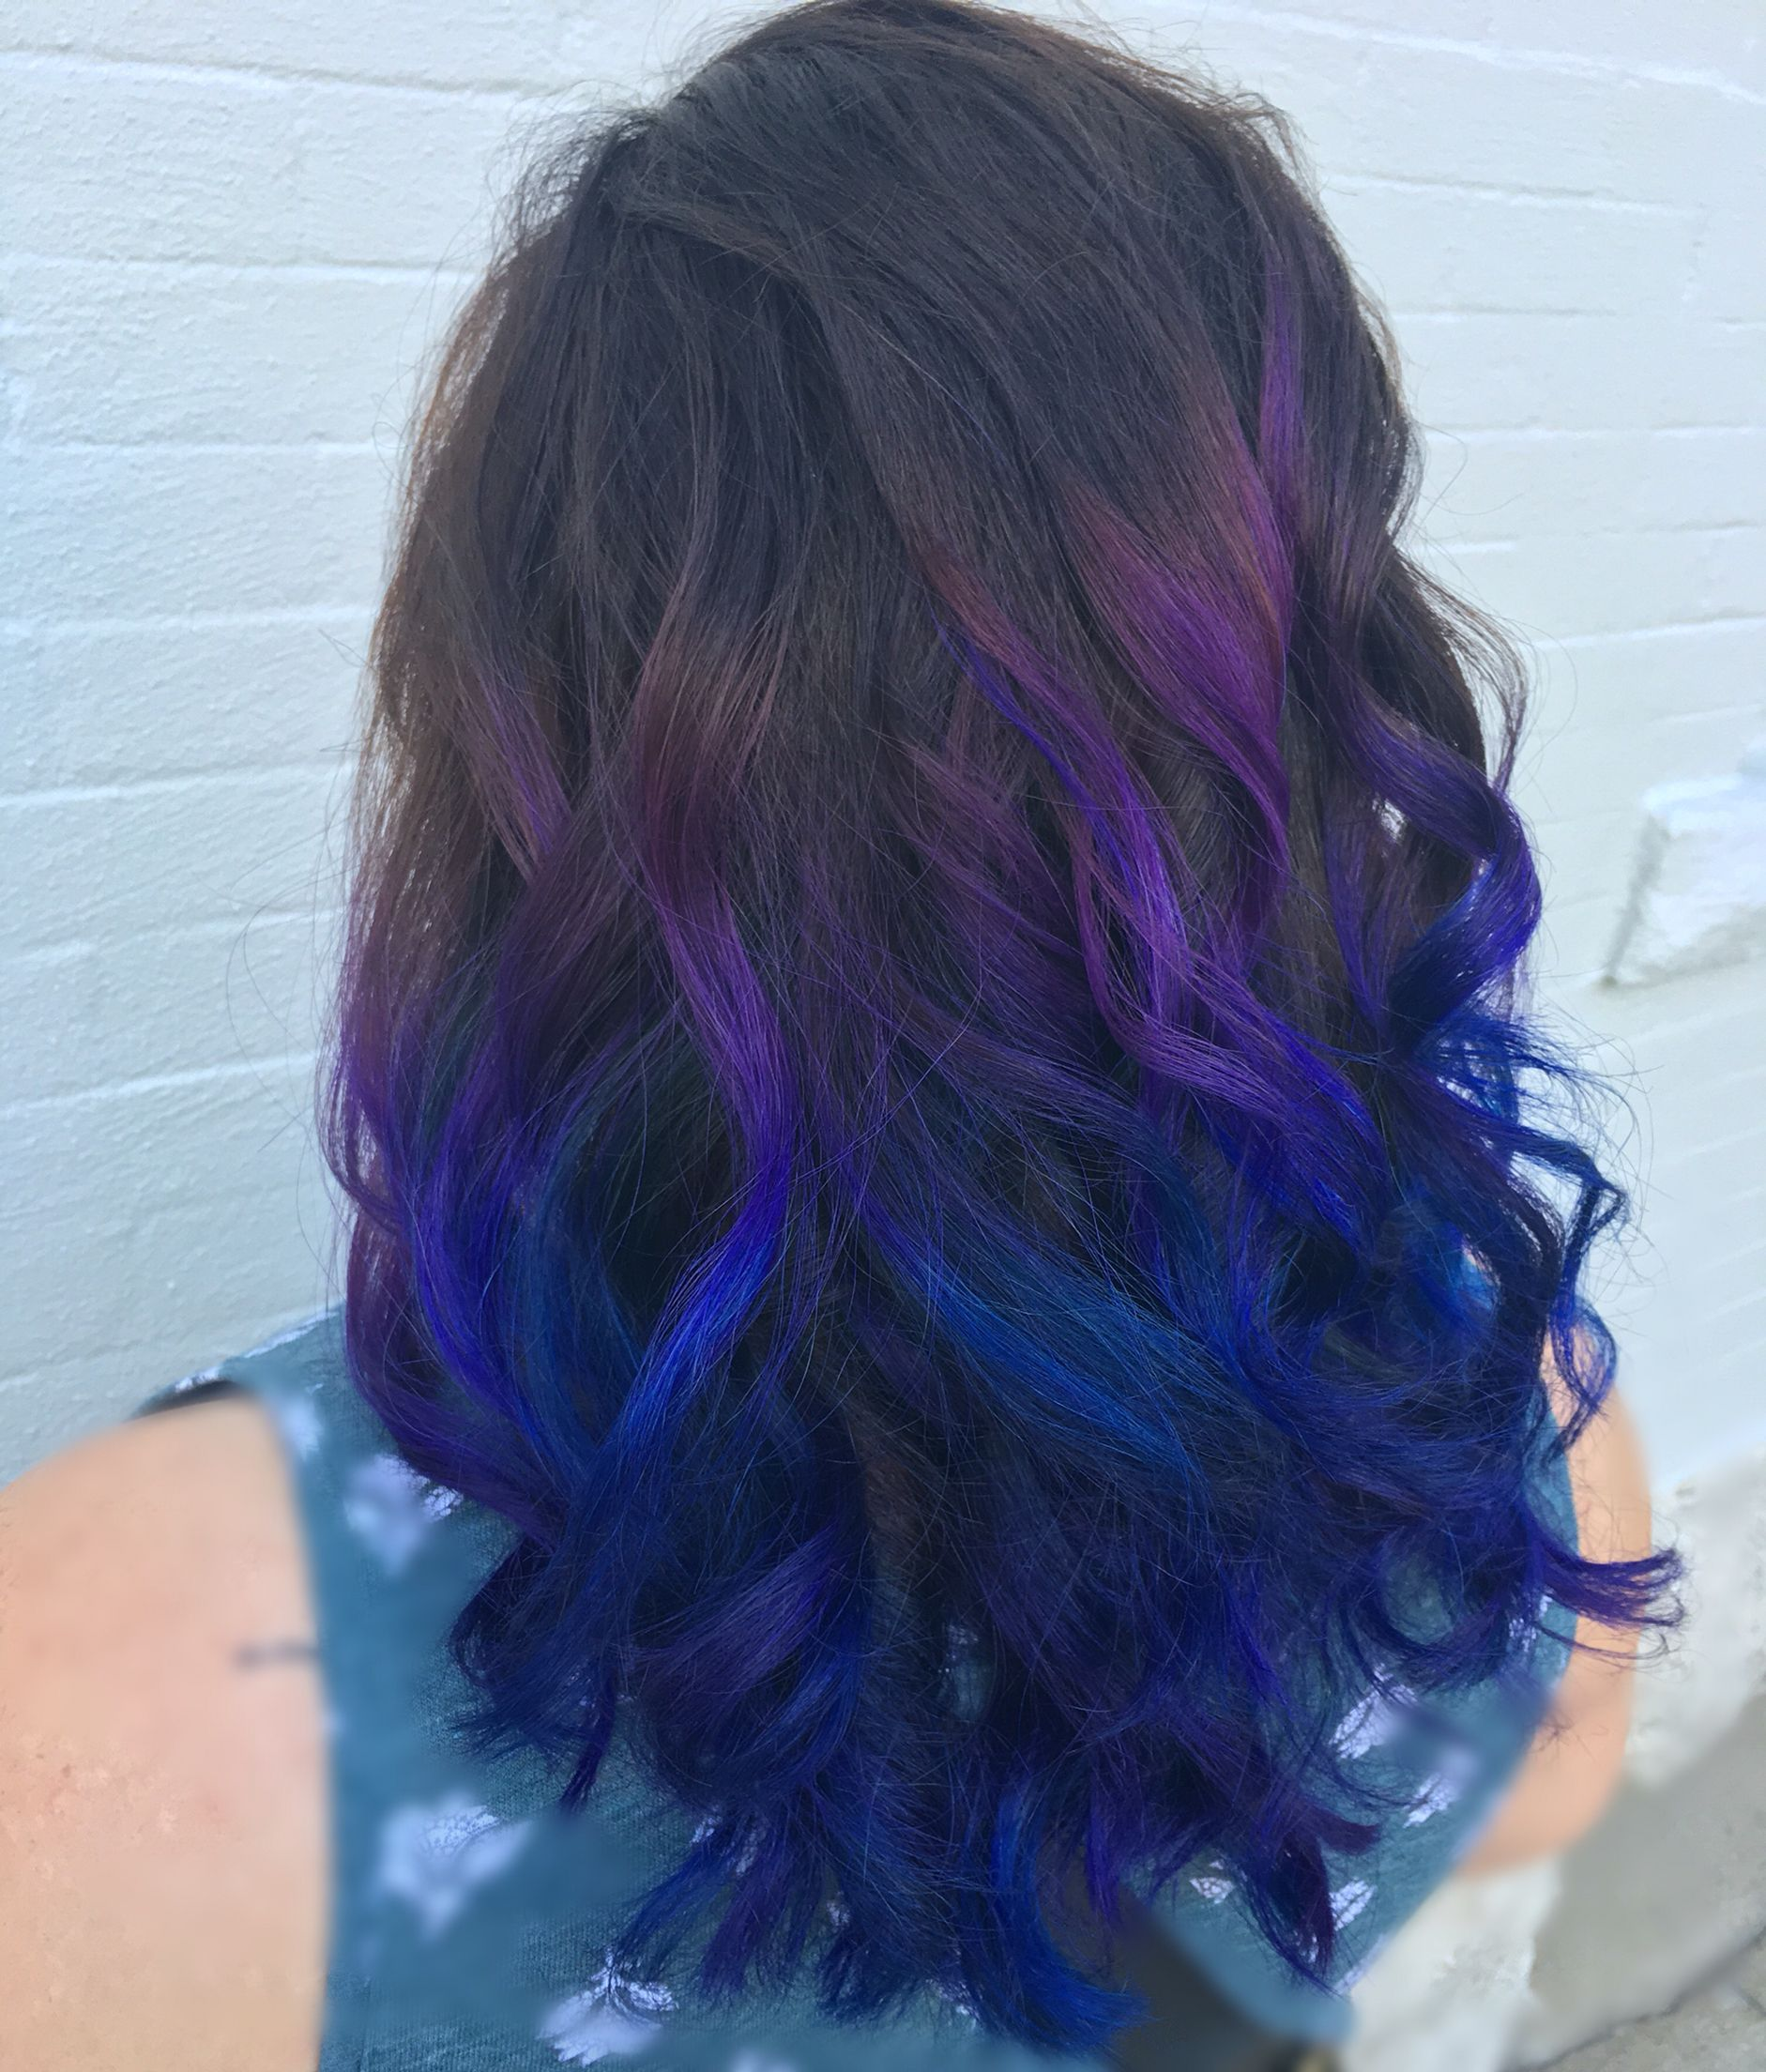 Pravana Purple Blue Magenta Hair Natural Level 5 Hair Used Redken 4n On Zone 1 Balayaged With Redken Flash Lift And 35 Vol Magenta Hair Hair Dye Tips Hair